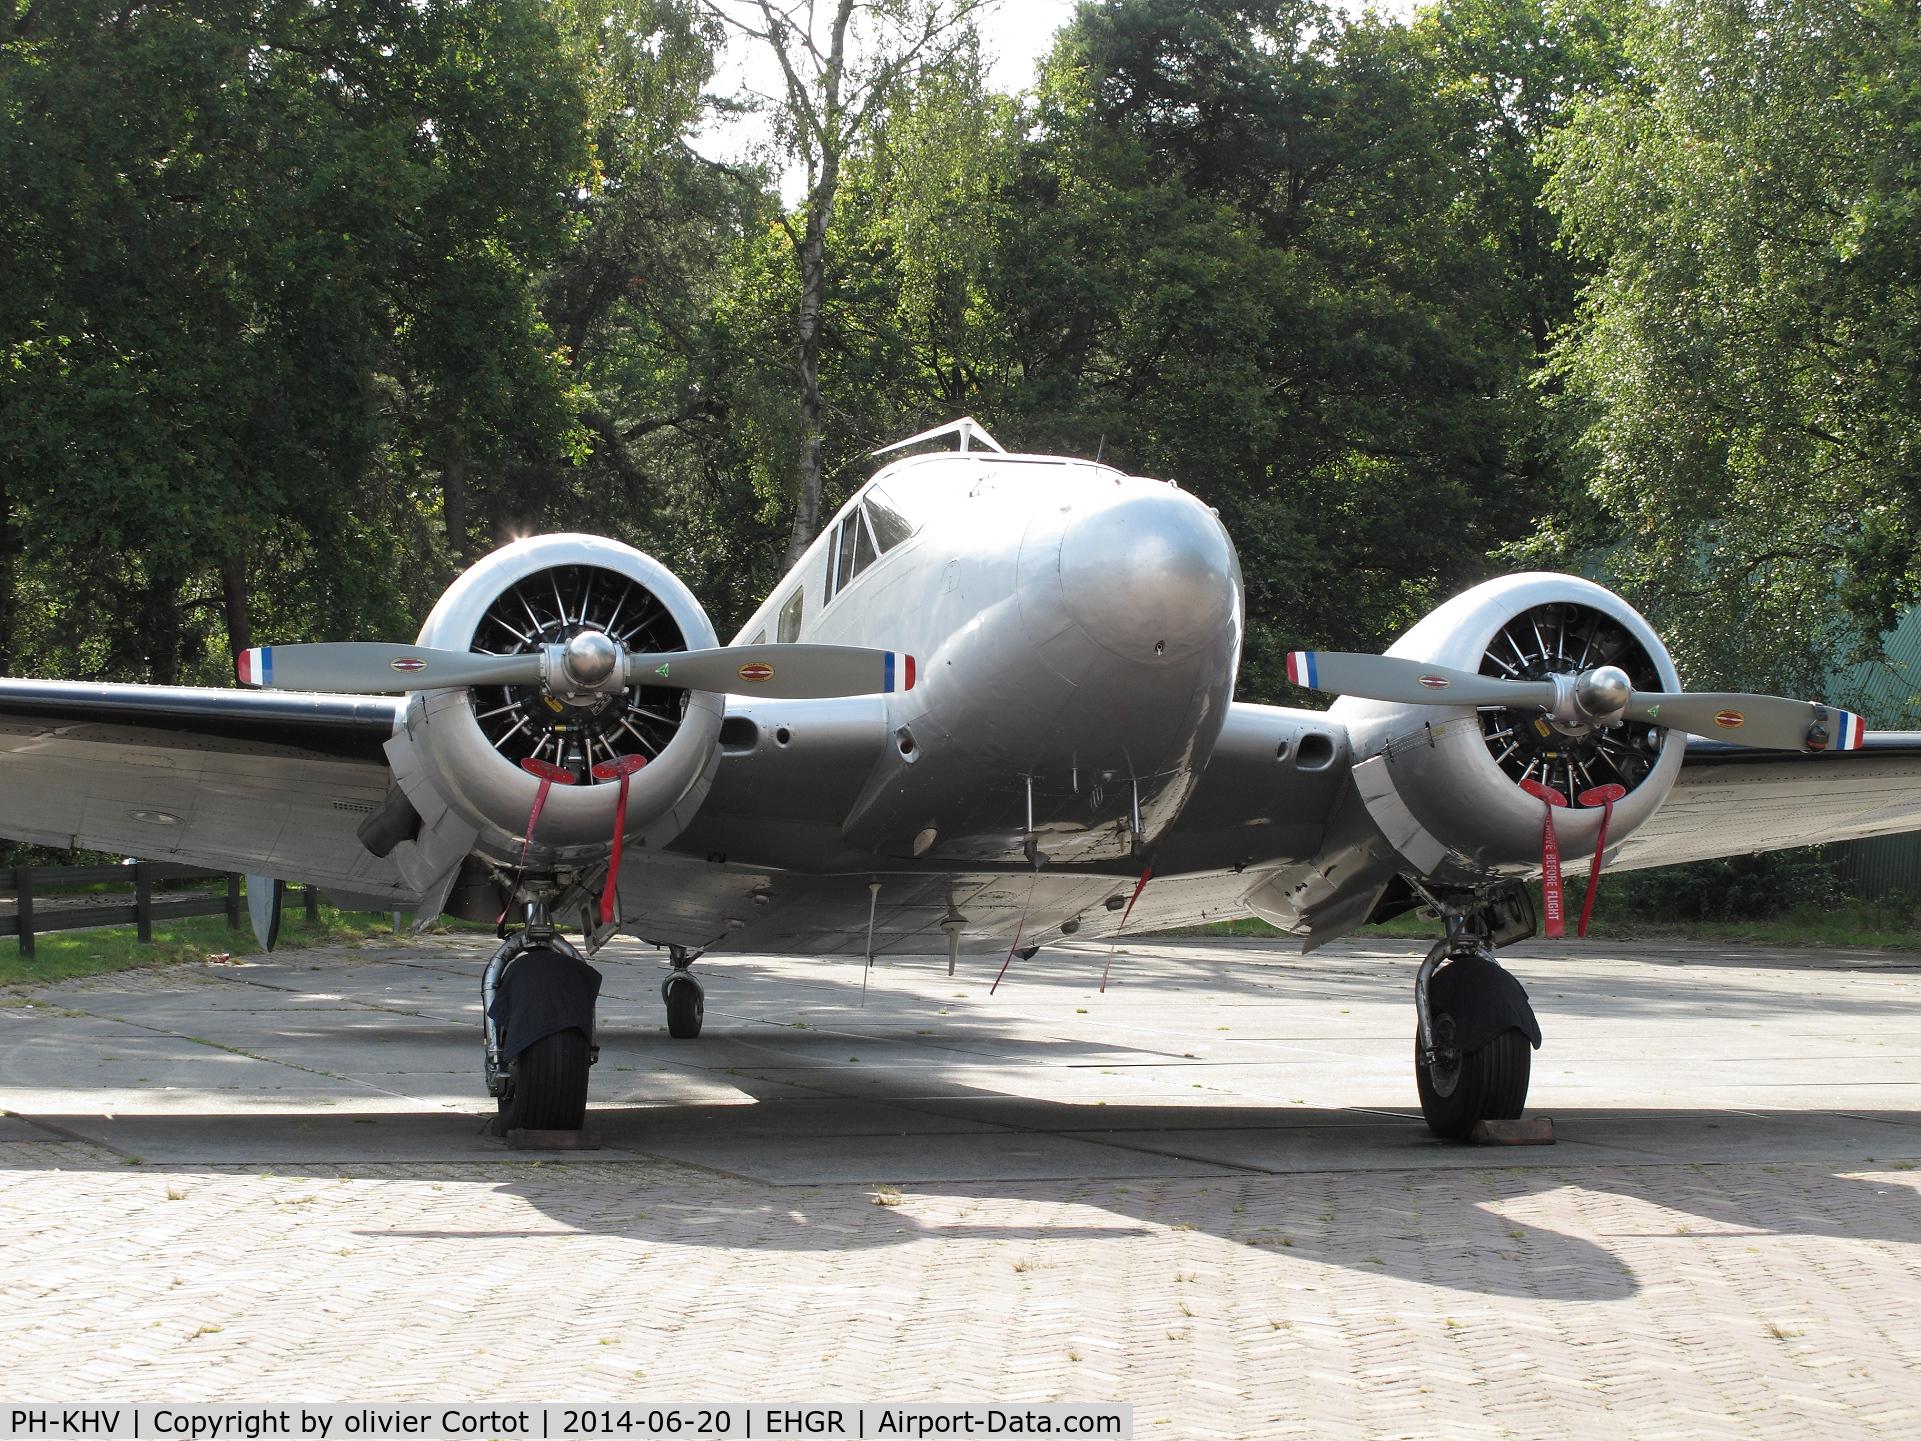 PH-KHV, 1952 Beech Expeditor 3NM (D18S) C/N A-904/CA-254, Gilze Rijen 2014